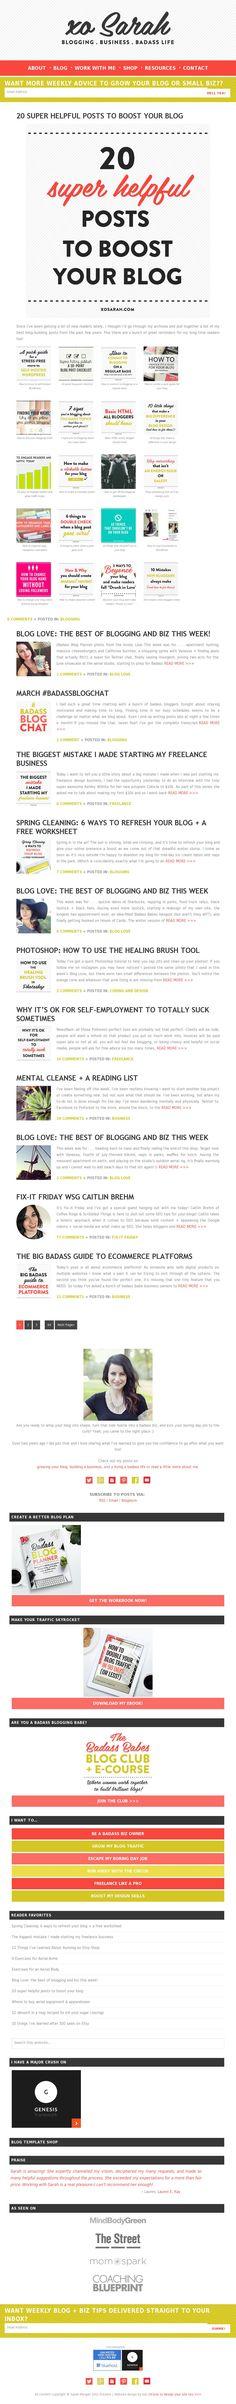 The website 'http://xosarah.com/' courtesy of @Pinstamatic (http://pinstamatic.com)